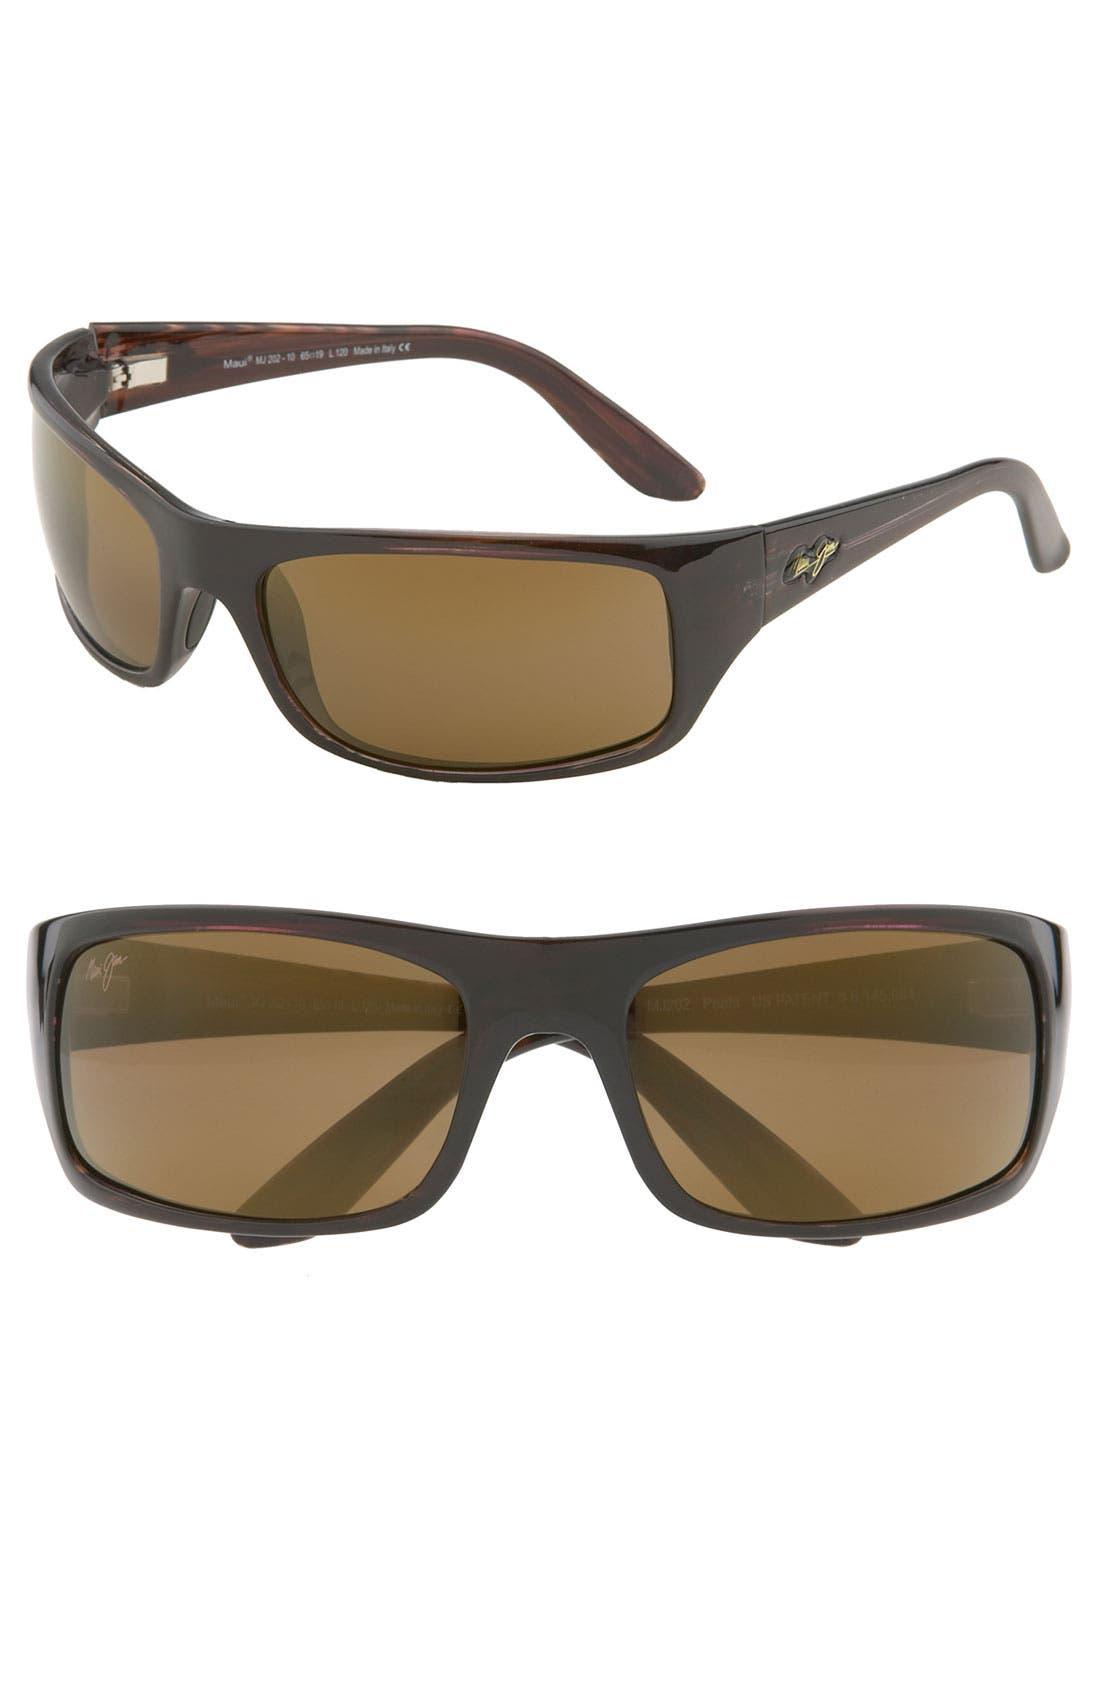 'Peahi - PolarizedPlus<sup>®</sup>2' 67mm Sunglasses,                         Main,                         color, Tortoise / Hcl Bronze Lens